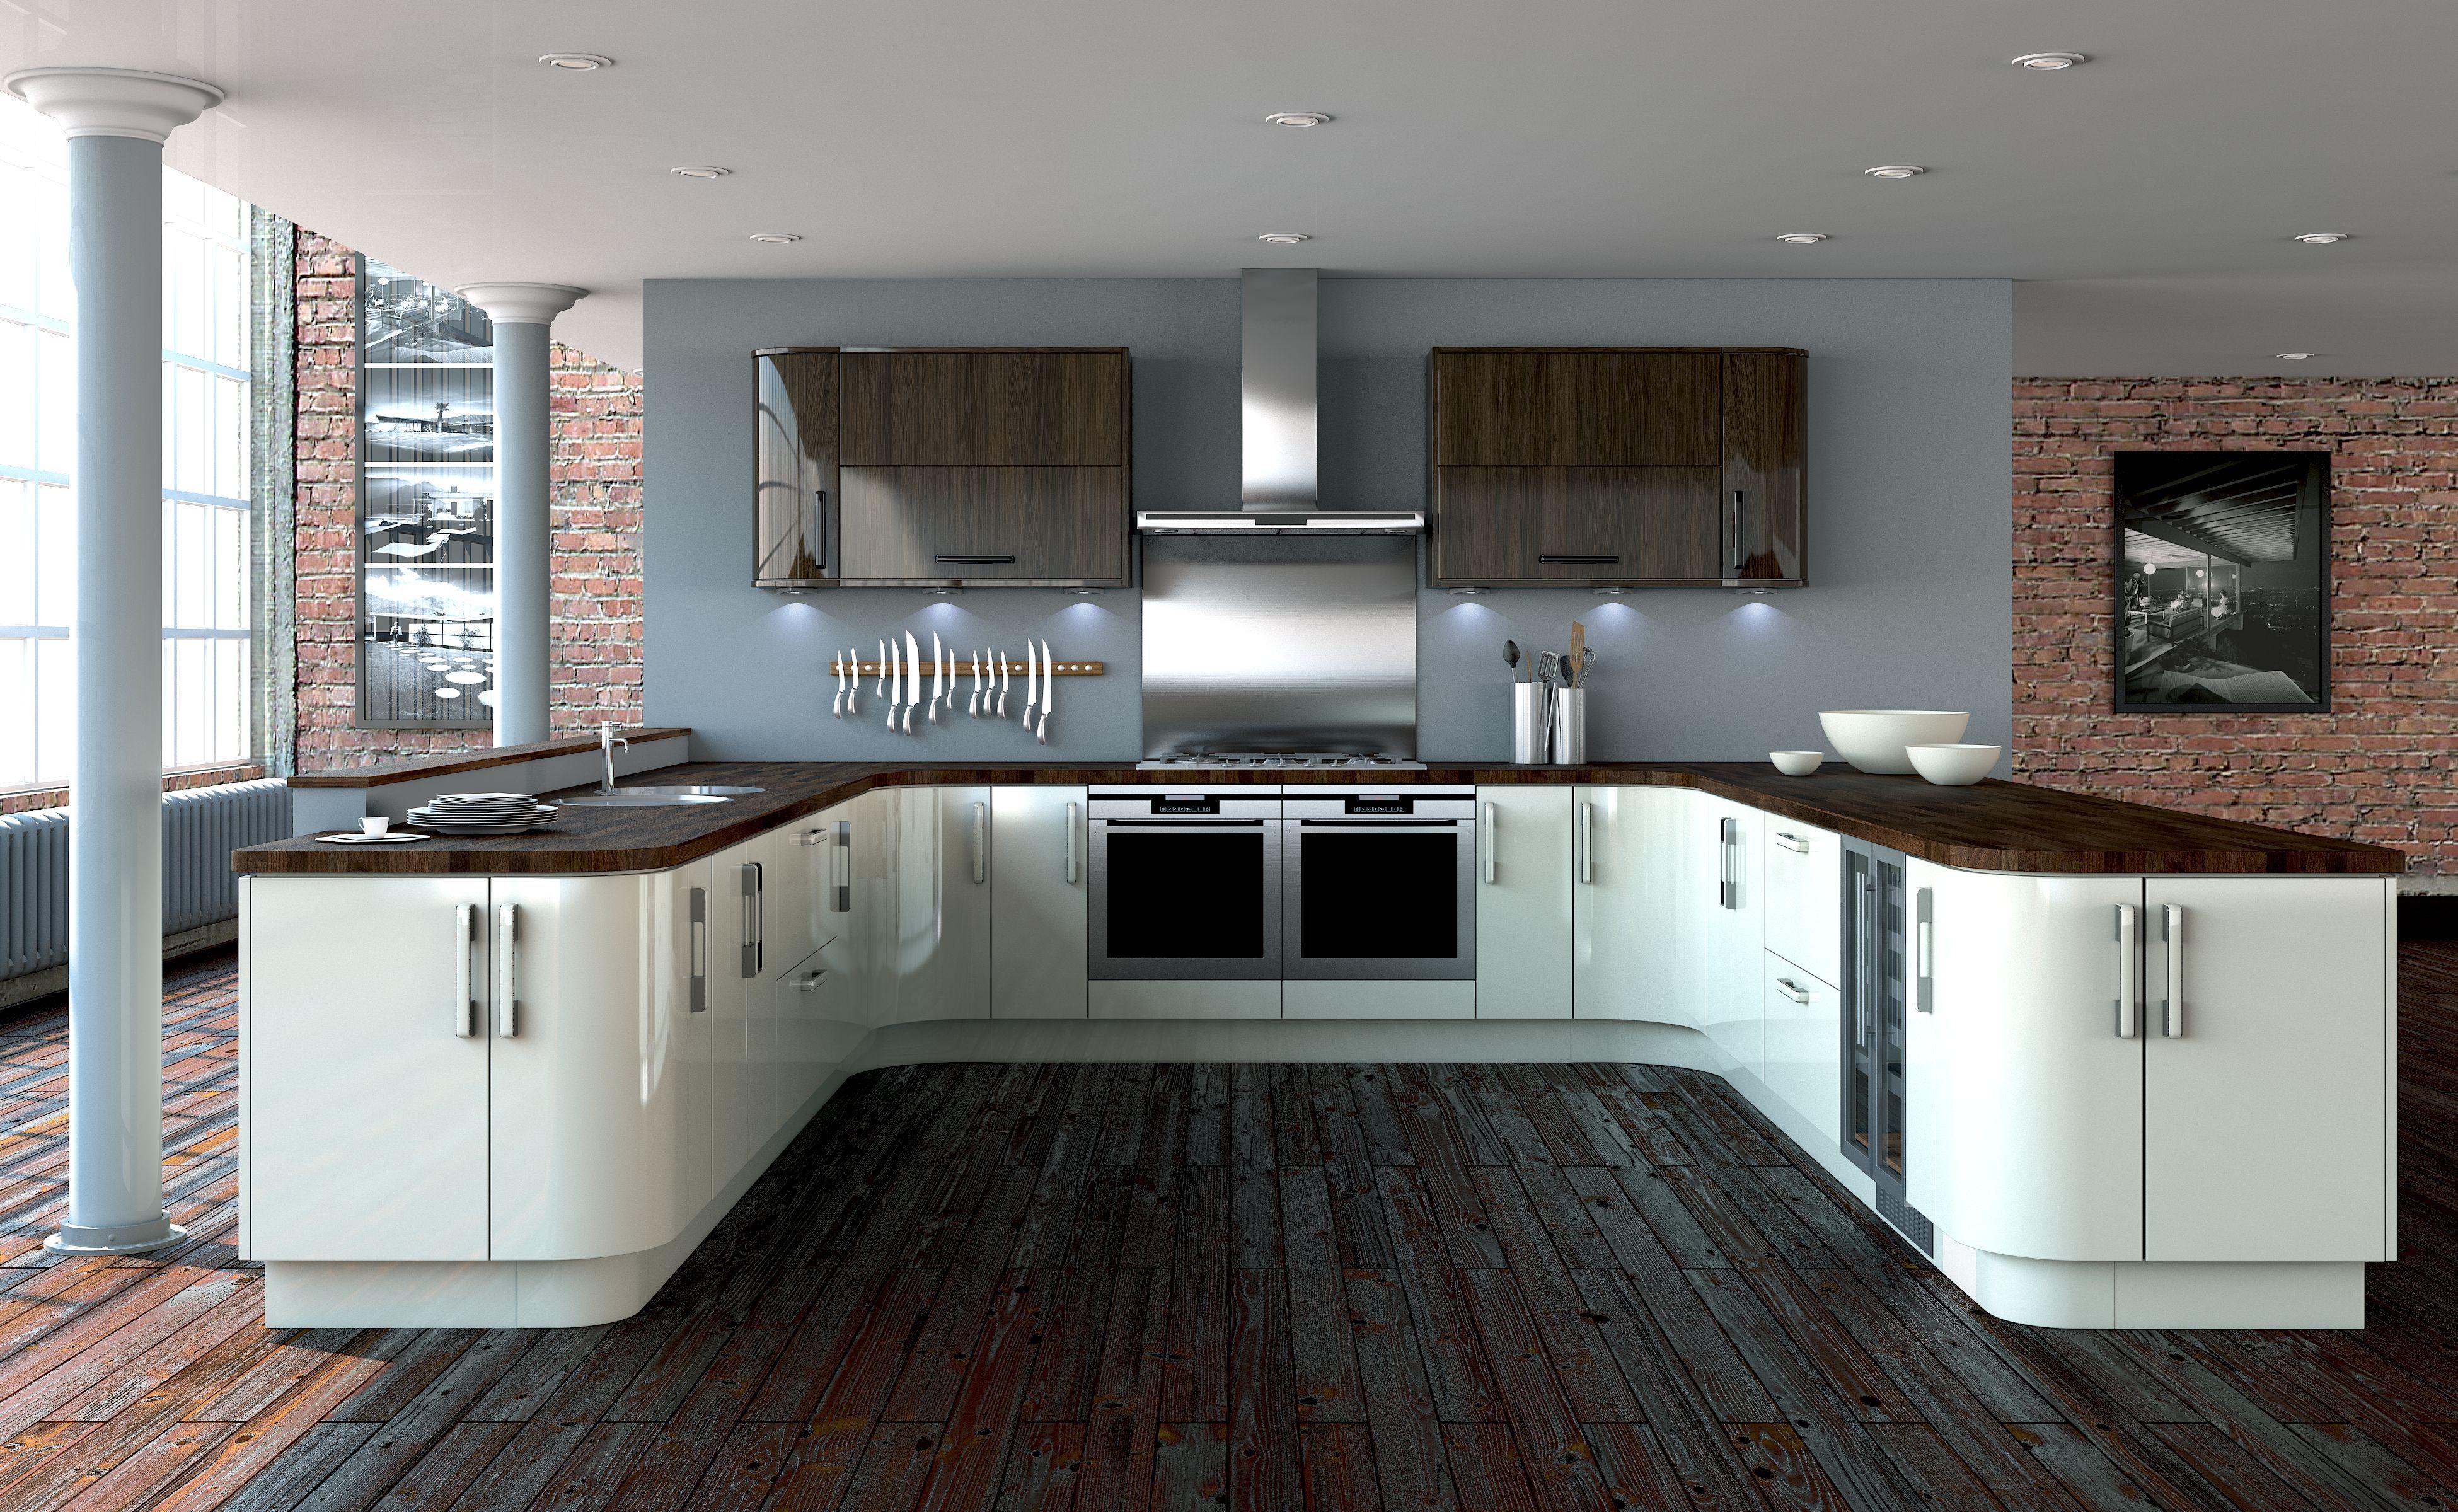 Boston Ivory Kitchen. http://www.academywindows.co.uk/?page=Kitchens ...